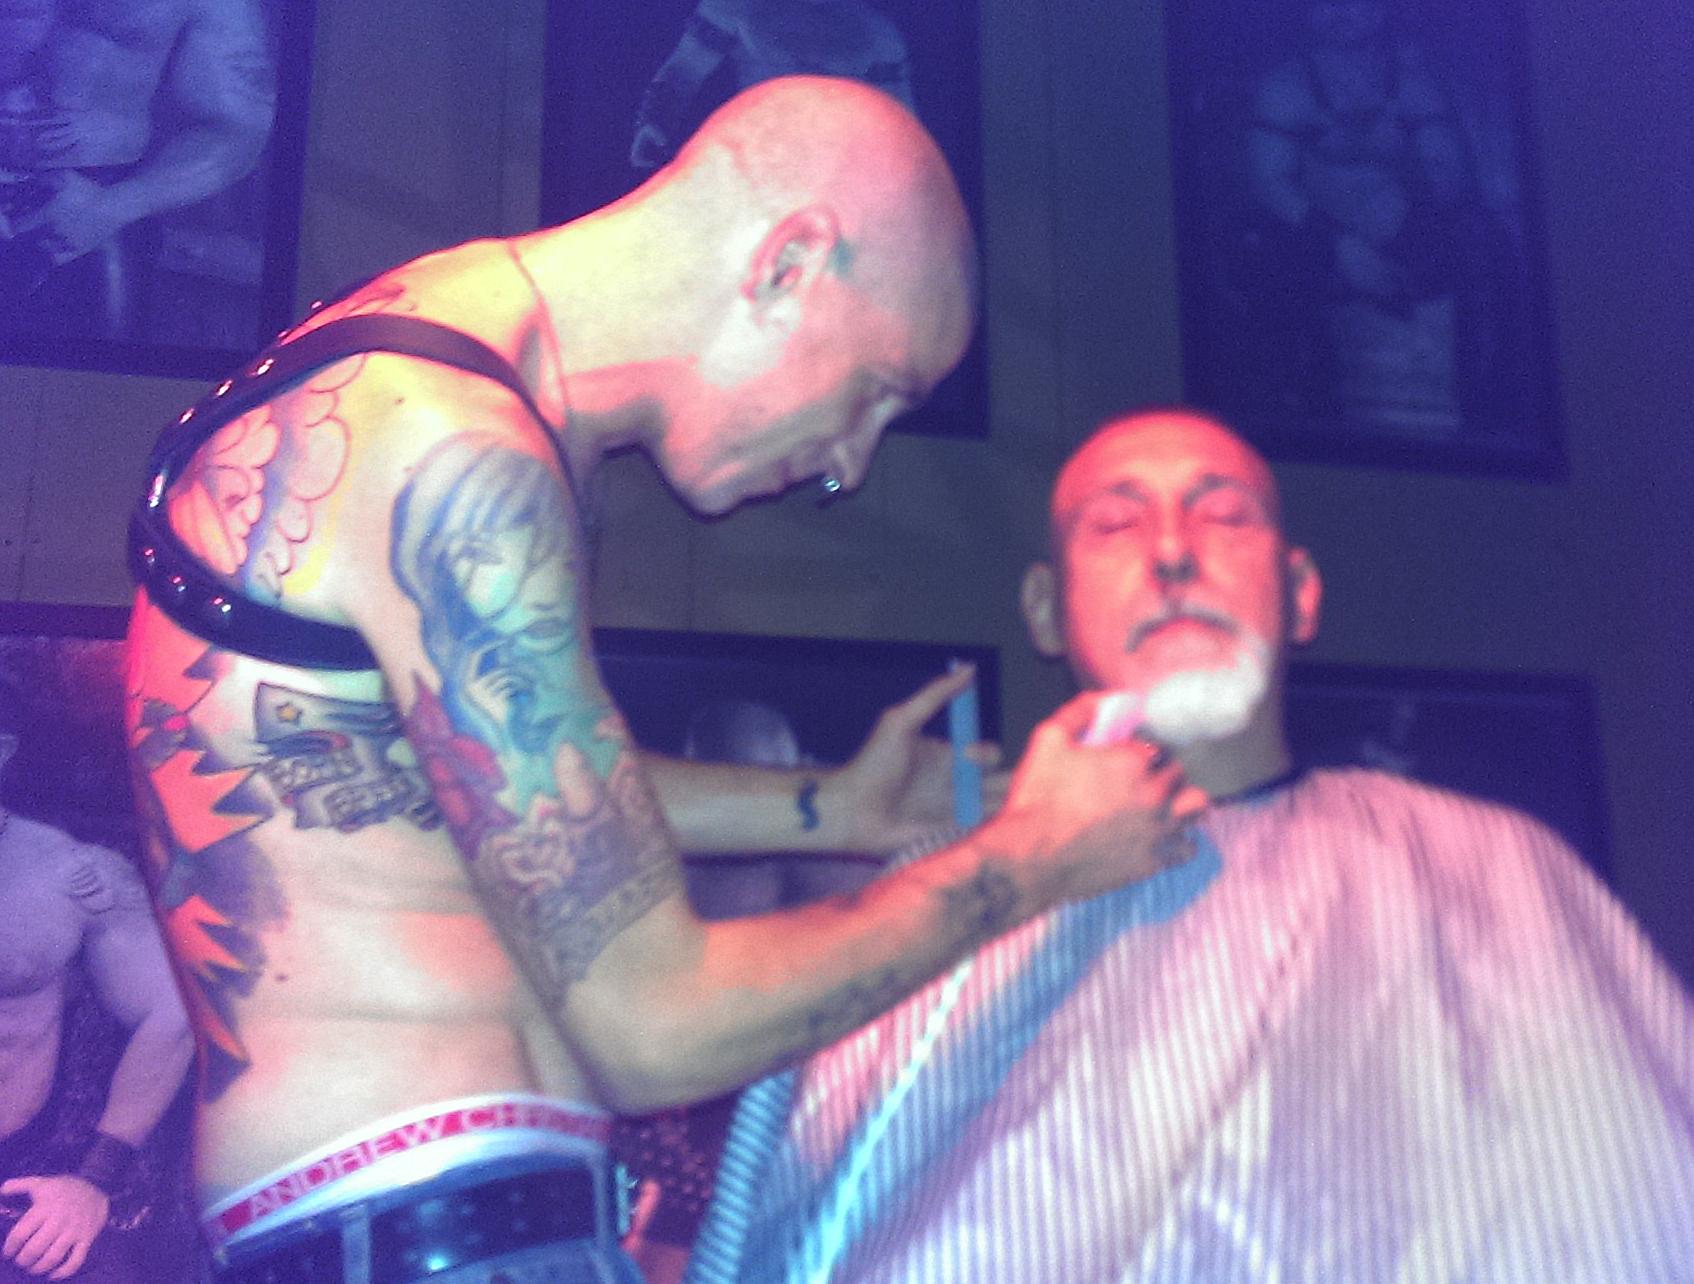 Justin shaves Bryan